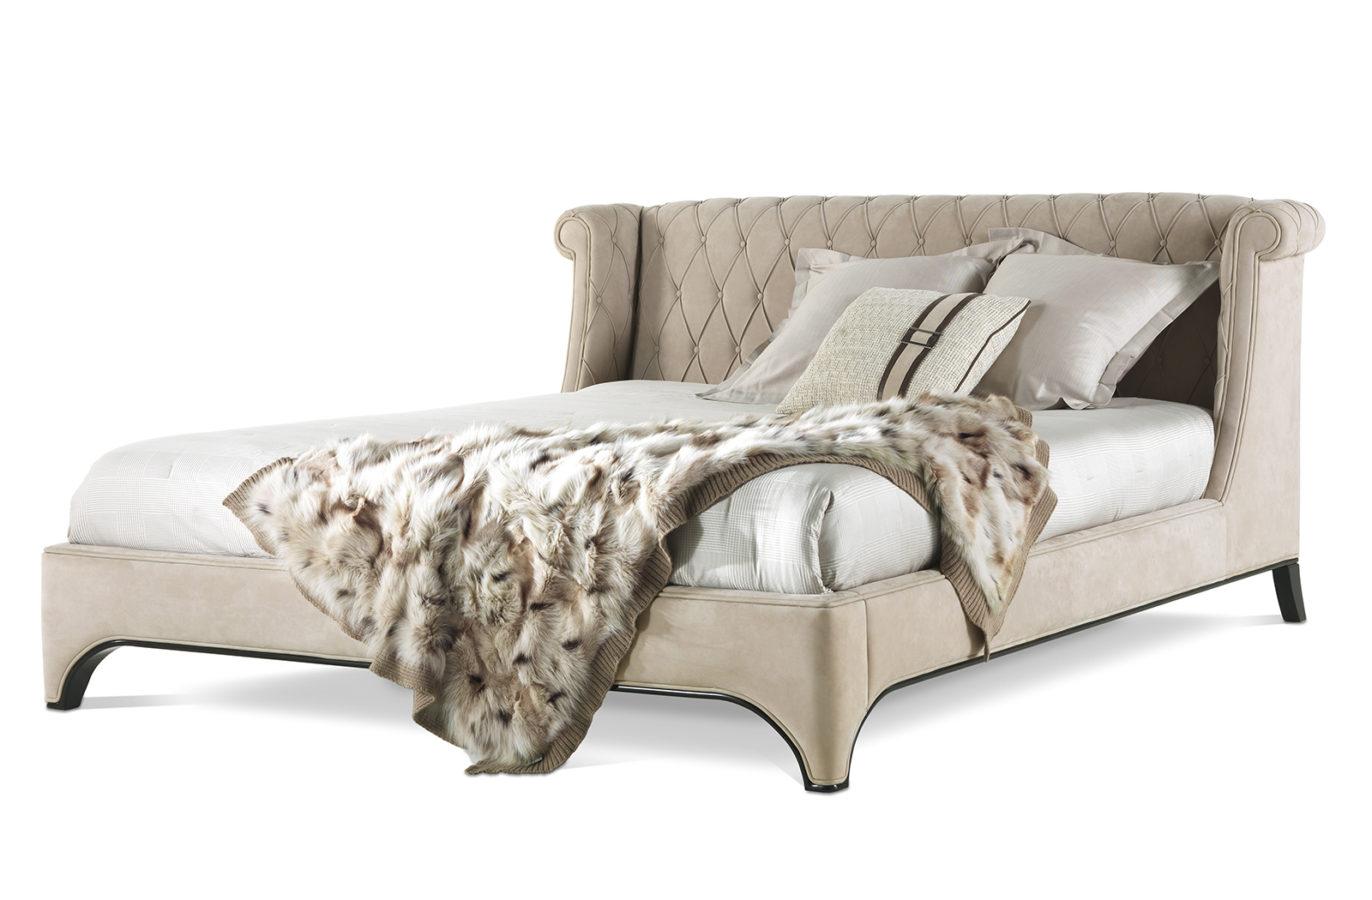 Gianfranco Ferre Home Bradmore Bed